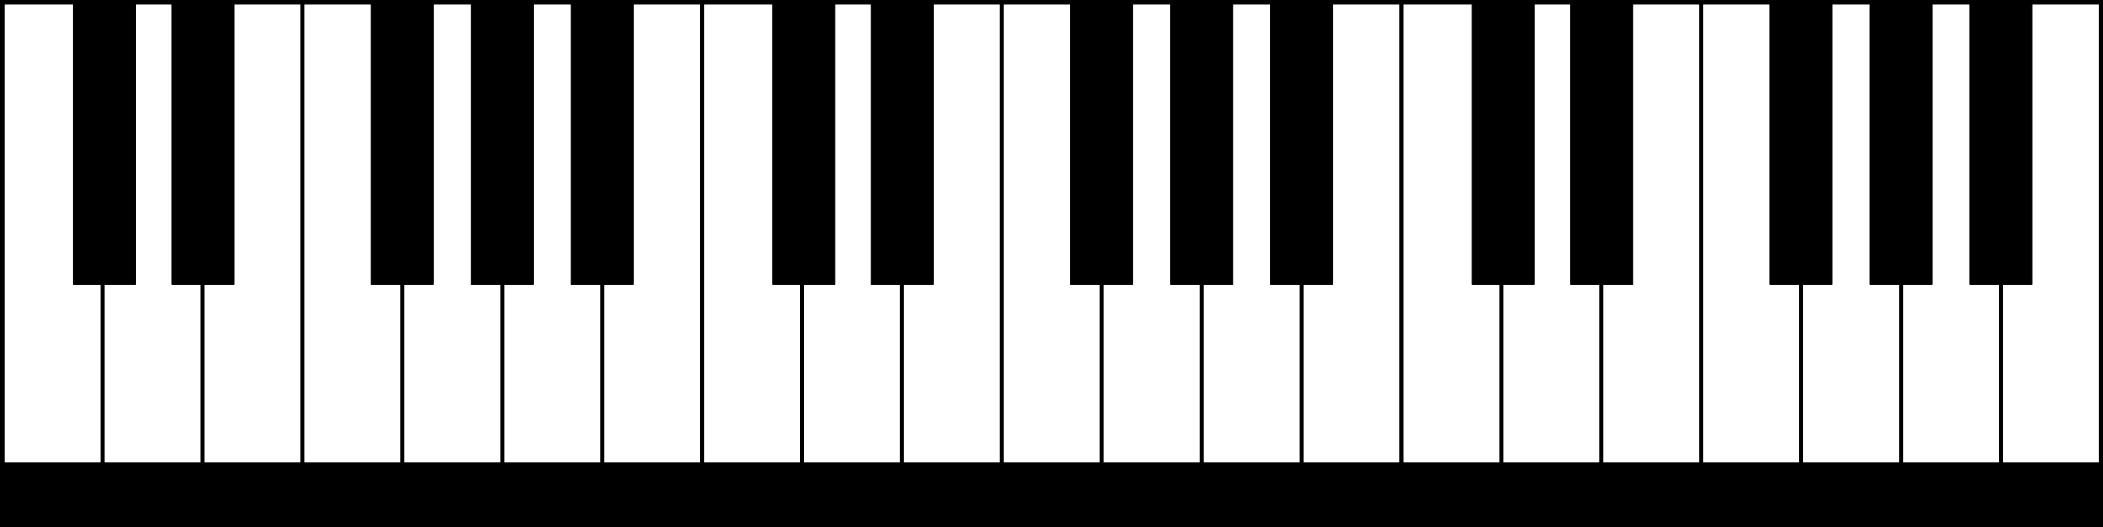 File klaviatur en svg. Piano clipart octave